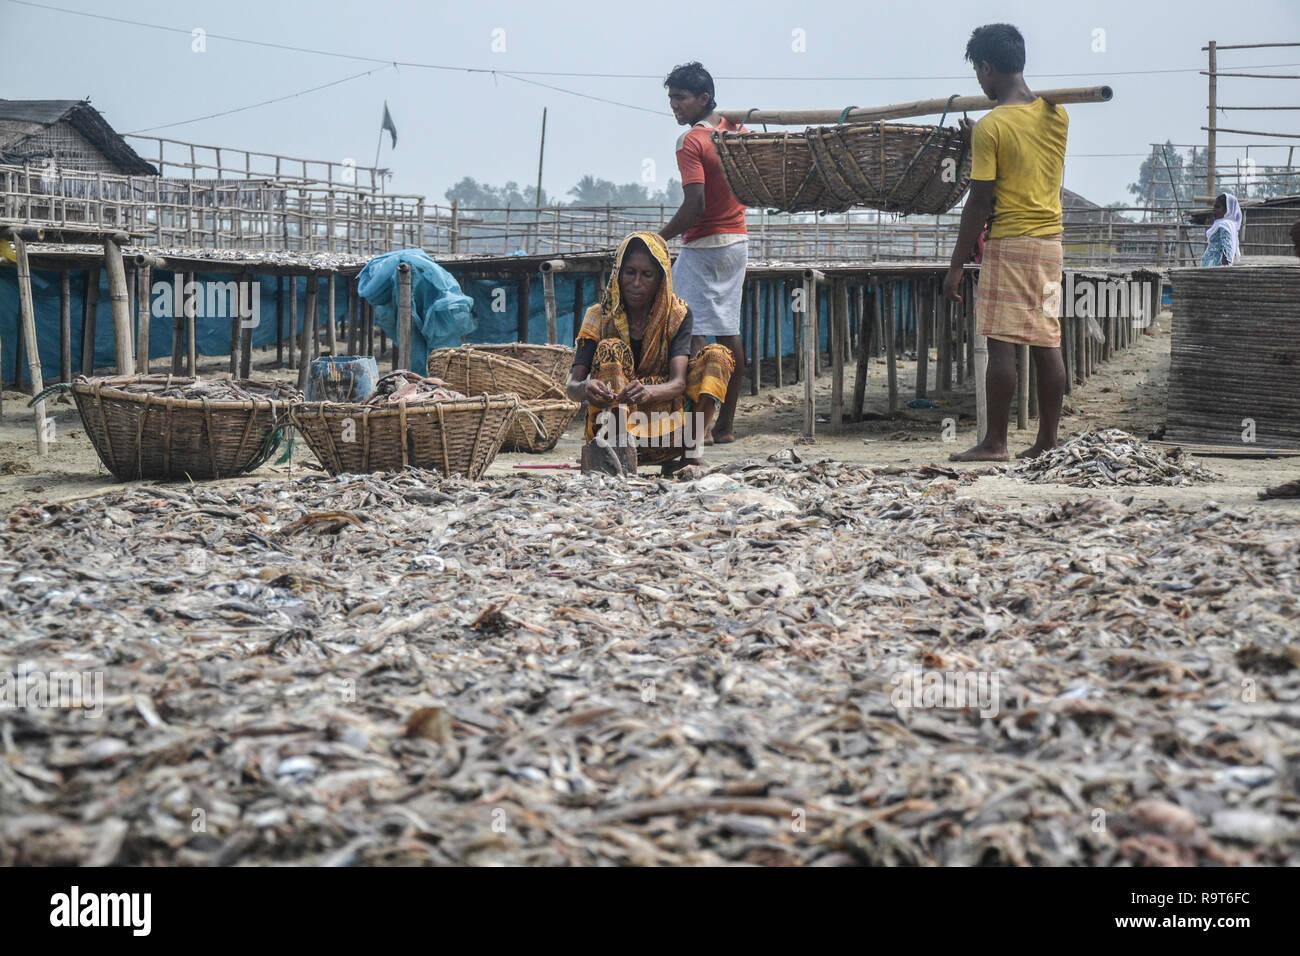 women laborers dried fish in a village at saint martin island in Cox's Bazar, Bangladesh © Nazmul Islam/AlamyStock - Stock Image